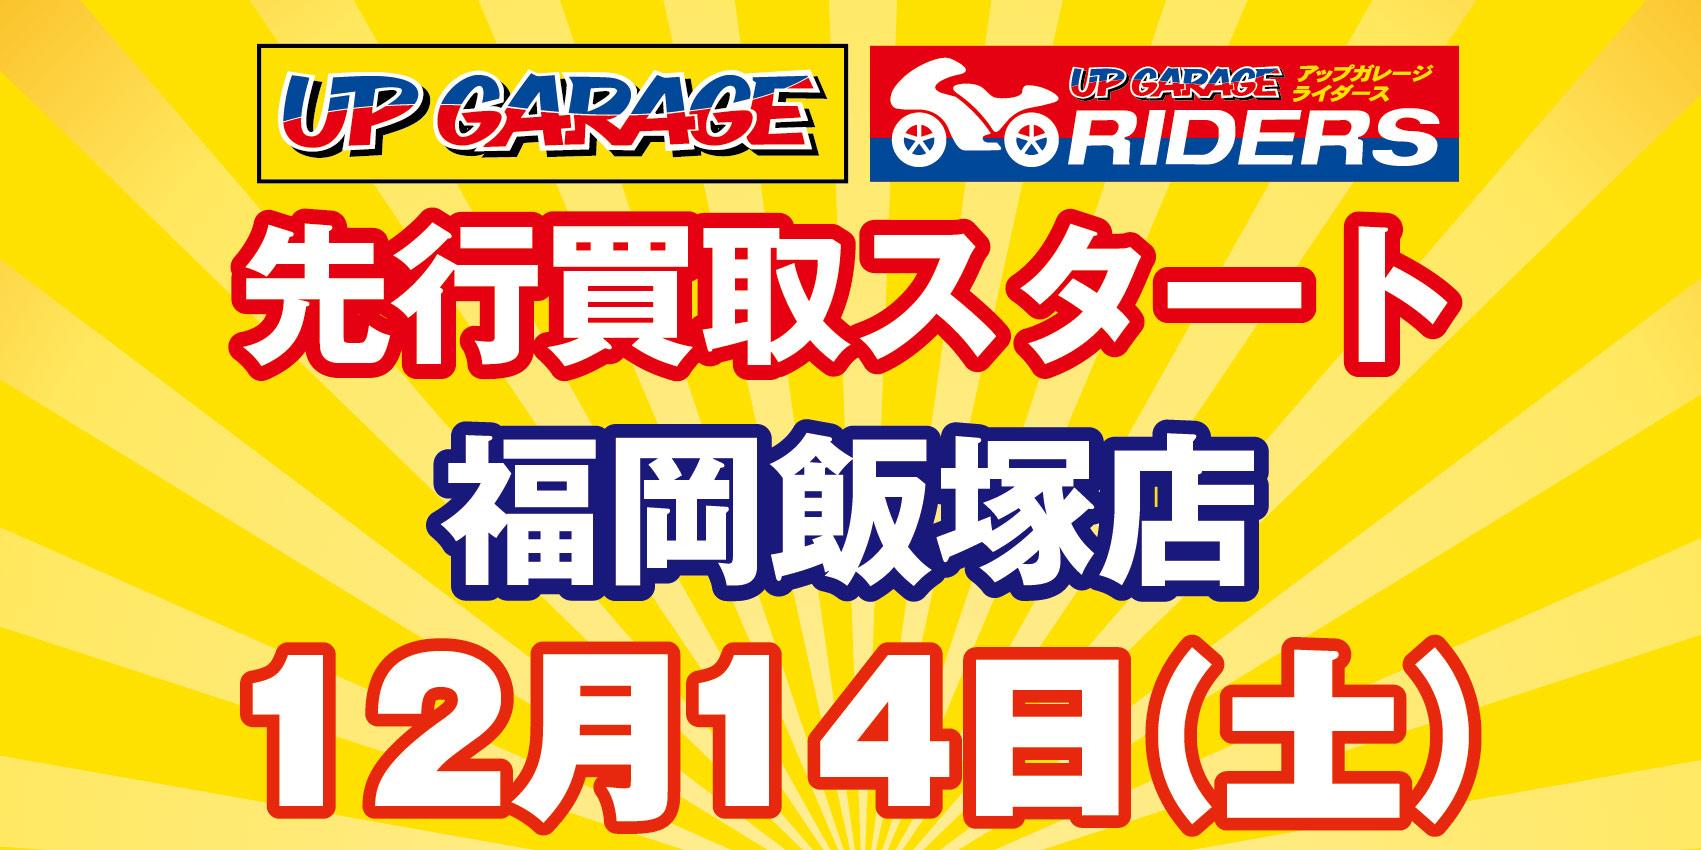 【福岡飯塚店】12月14日(土)先行買取スタート